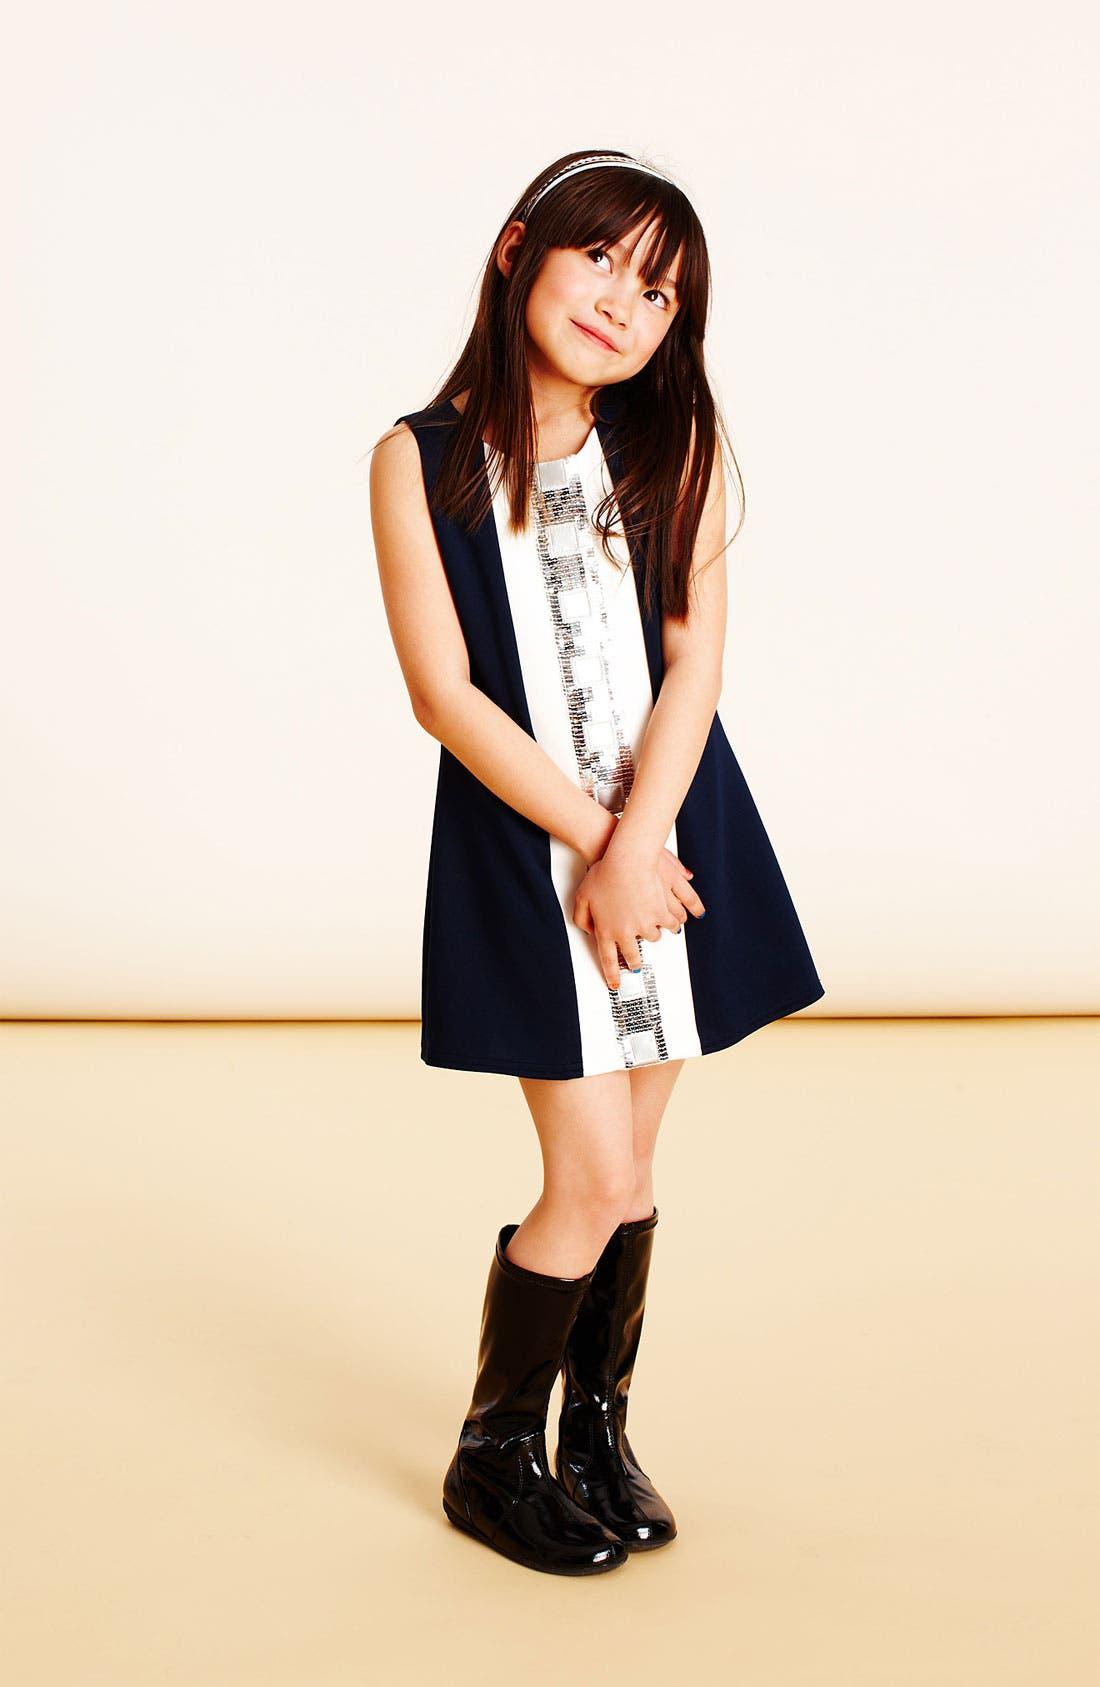 Alternate Image 1 Selected - Zoe Ltd 'Mod' Dress & Ruby & Bloom Cardigan (Big Girls)